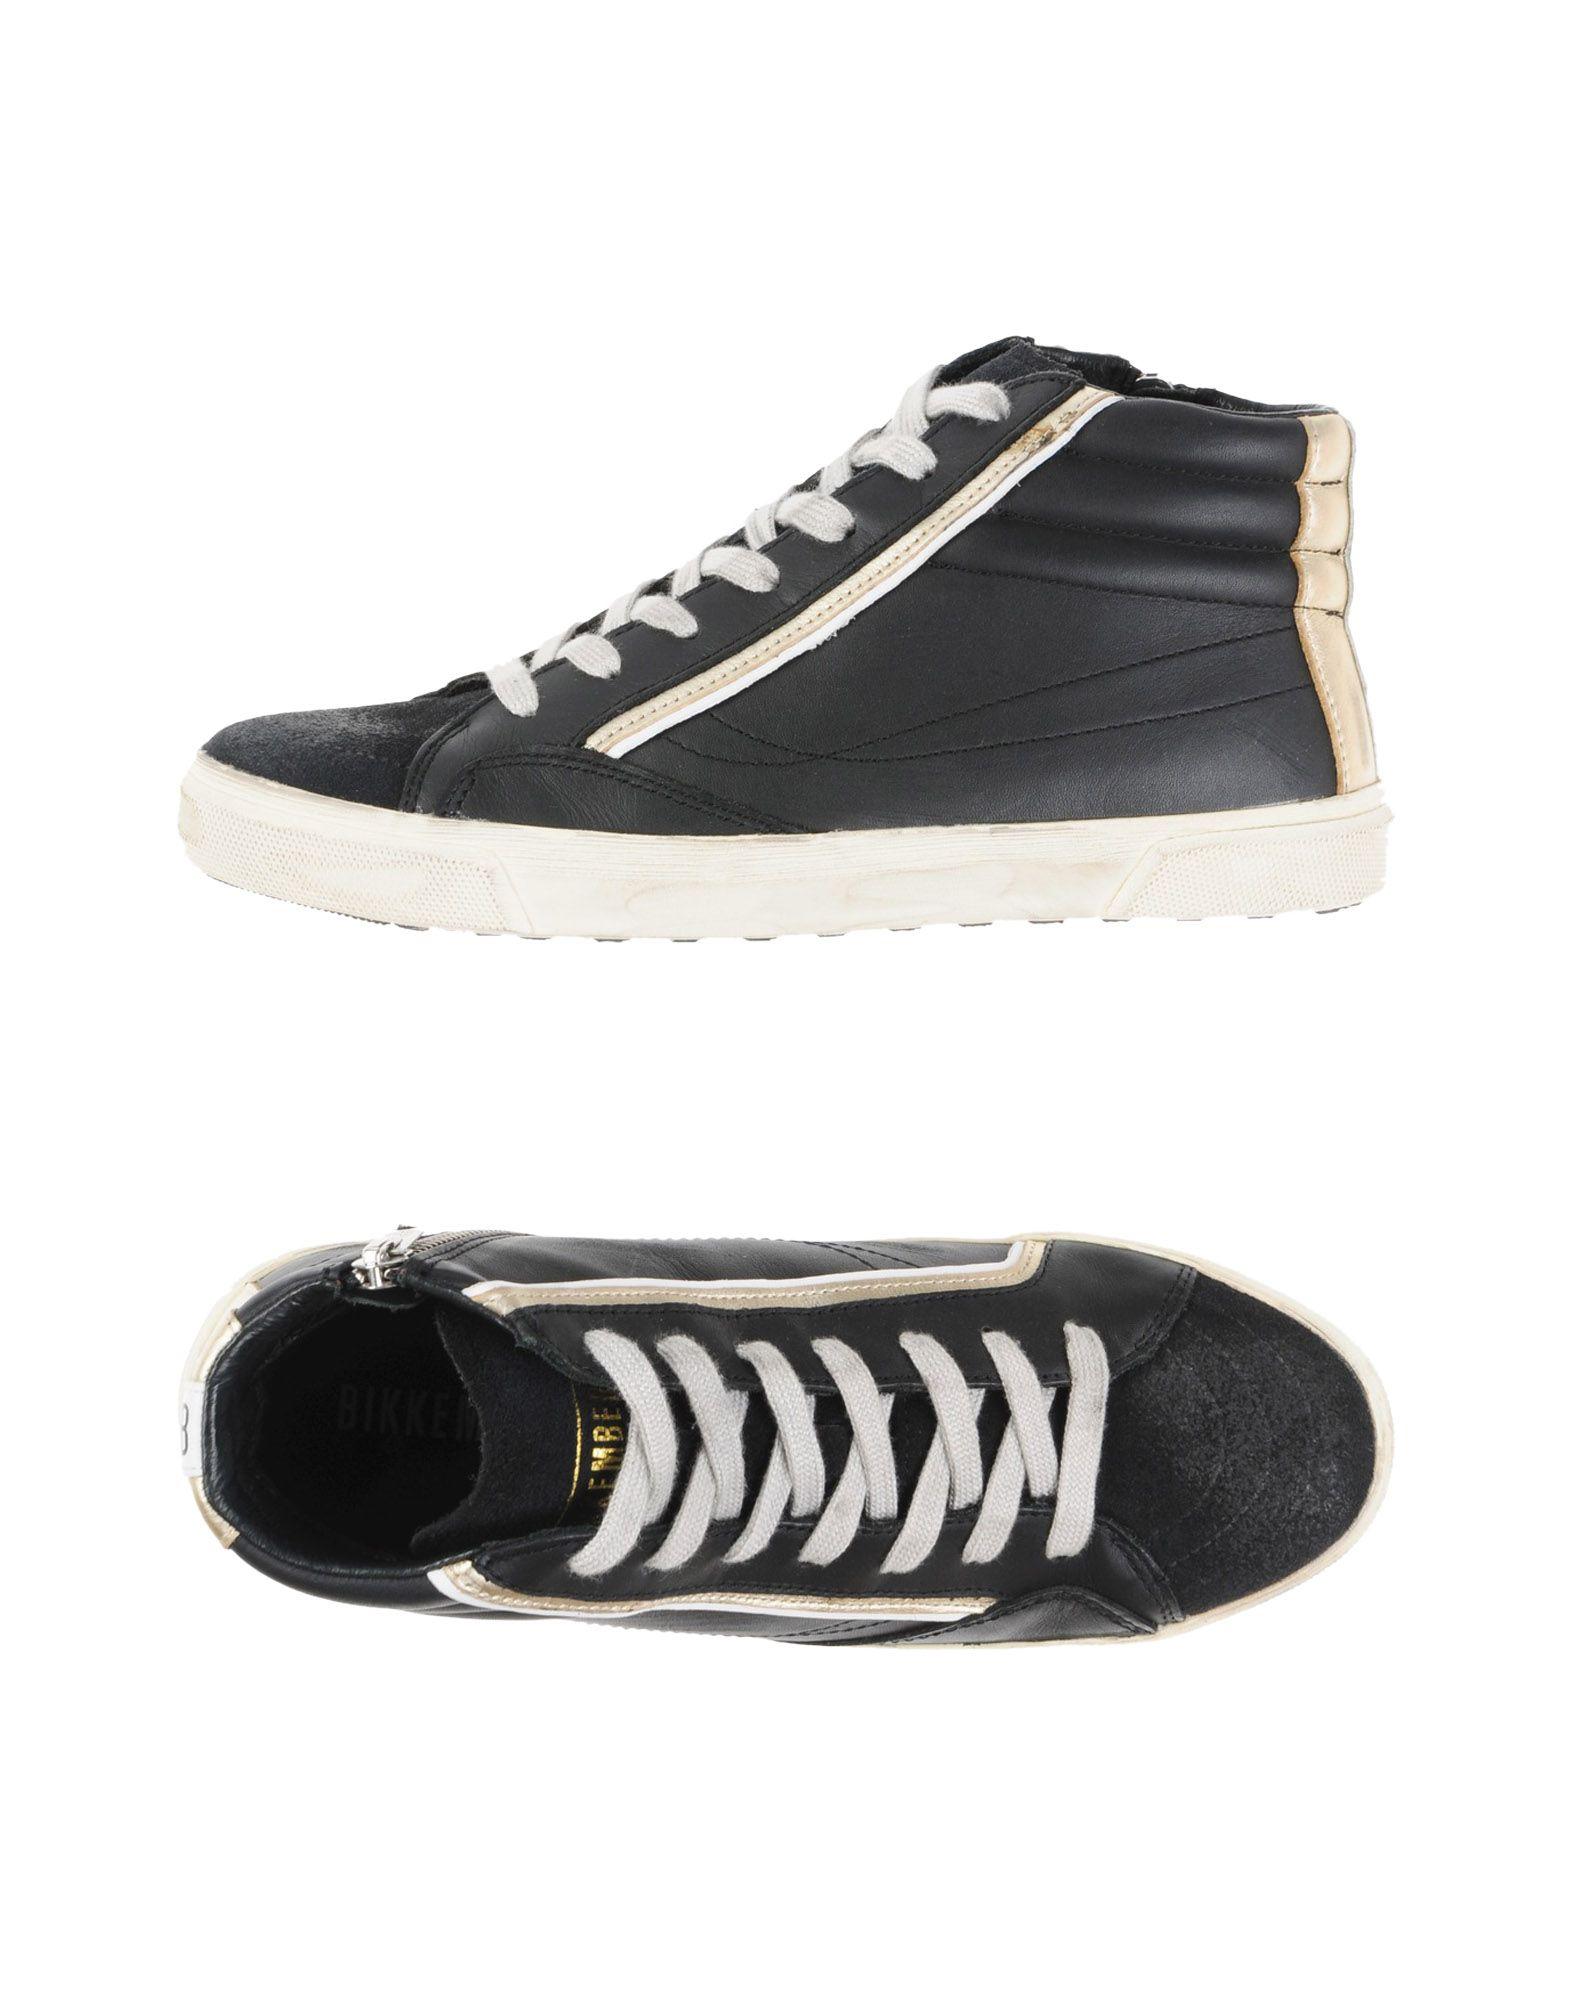 A buon mercato Sneakers Bikkembergs Donna - 11307302SR